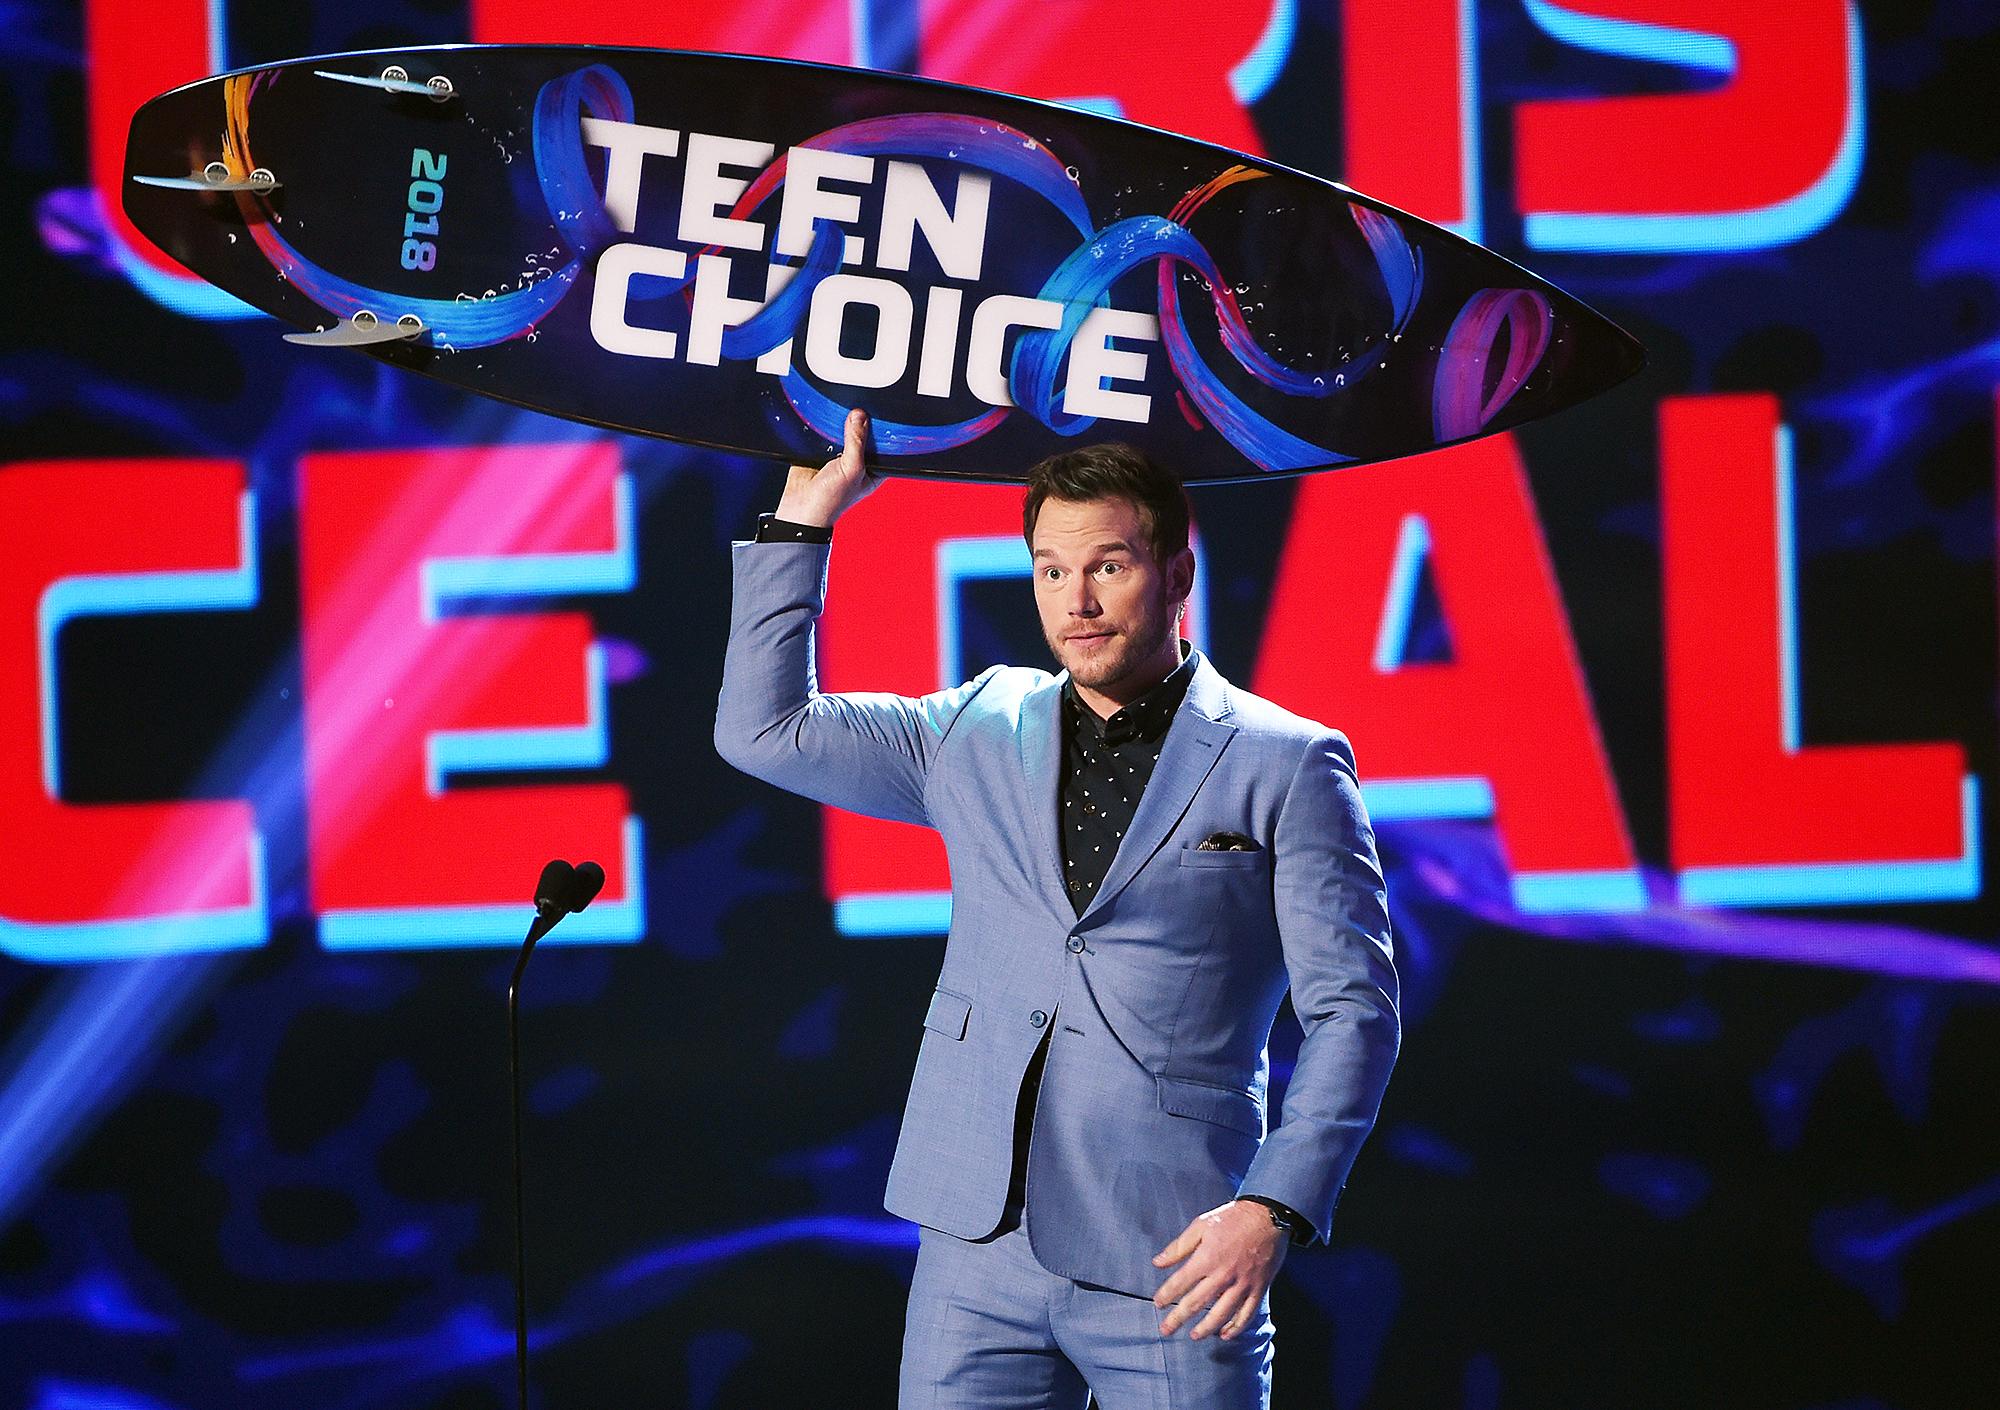 Chris Pratt Teen Choice Awards 2018